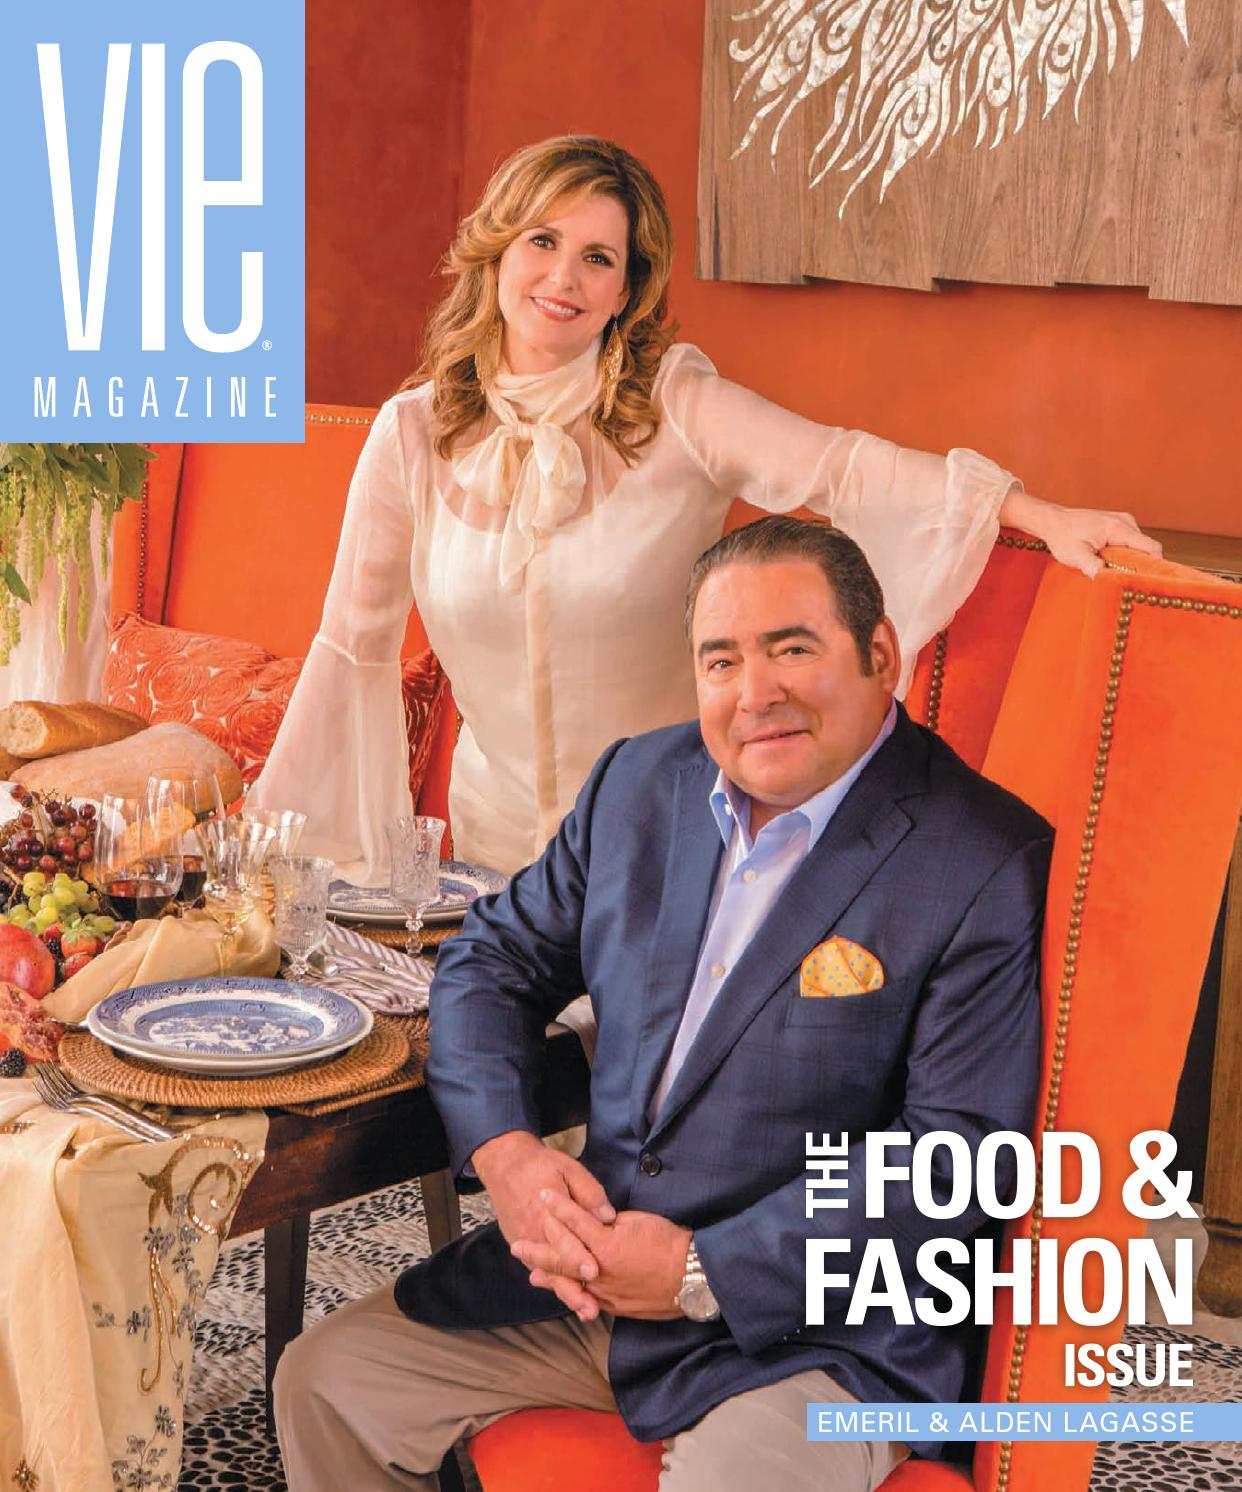 Vie Magazine March April 2014 By Cornerstone Marketing